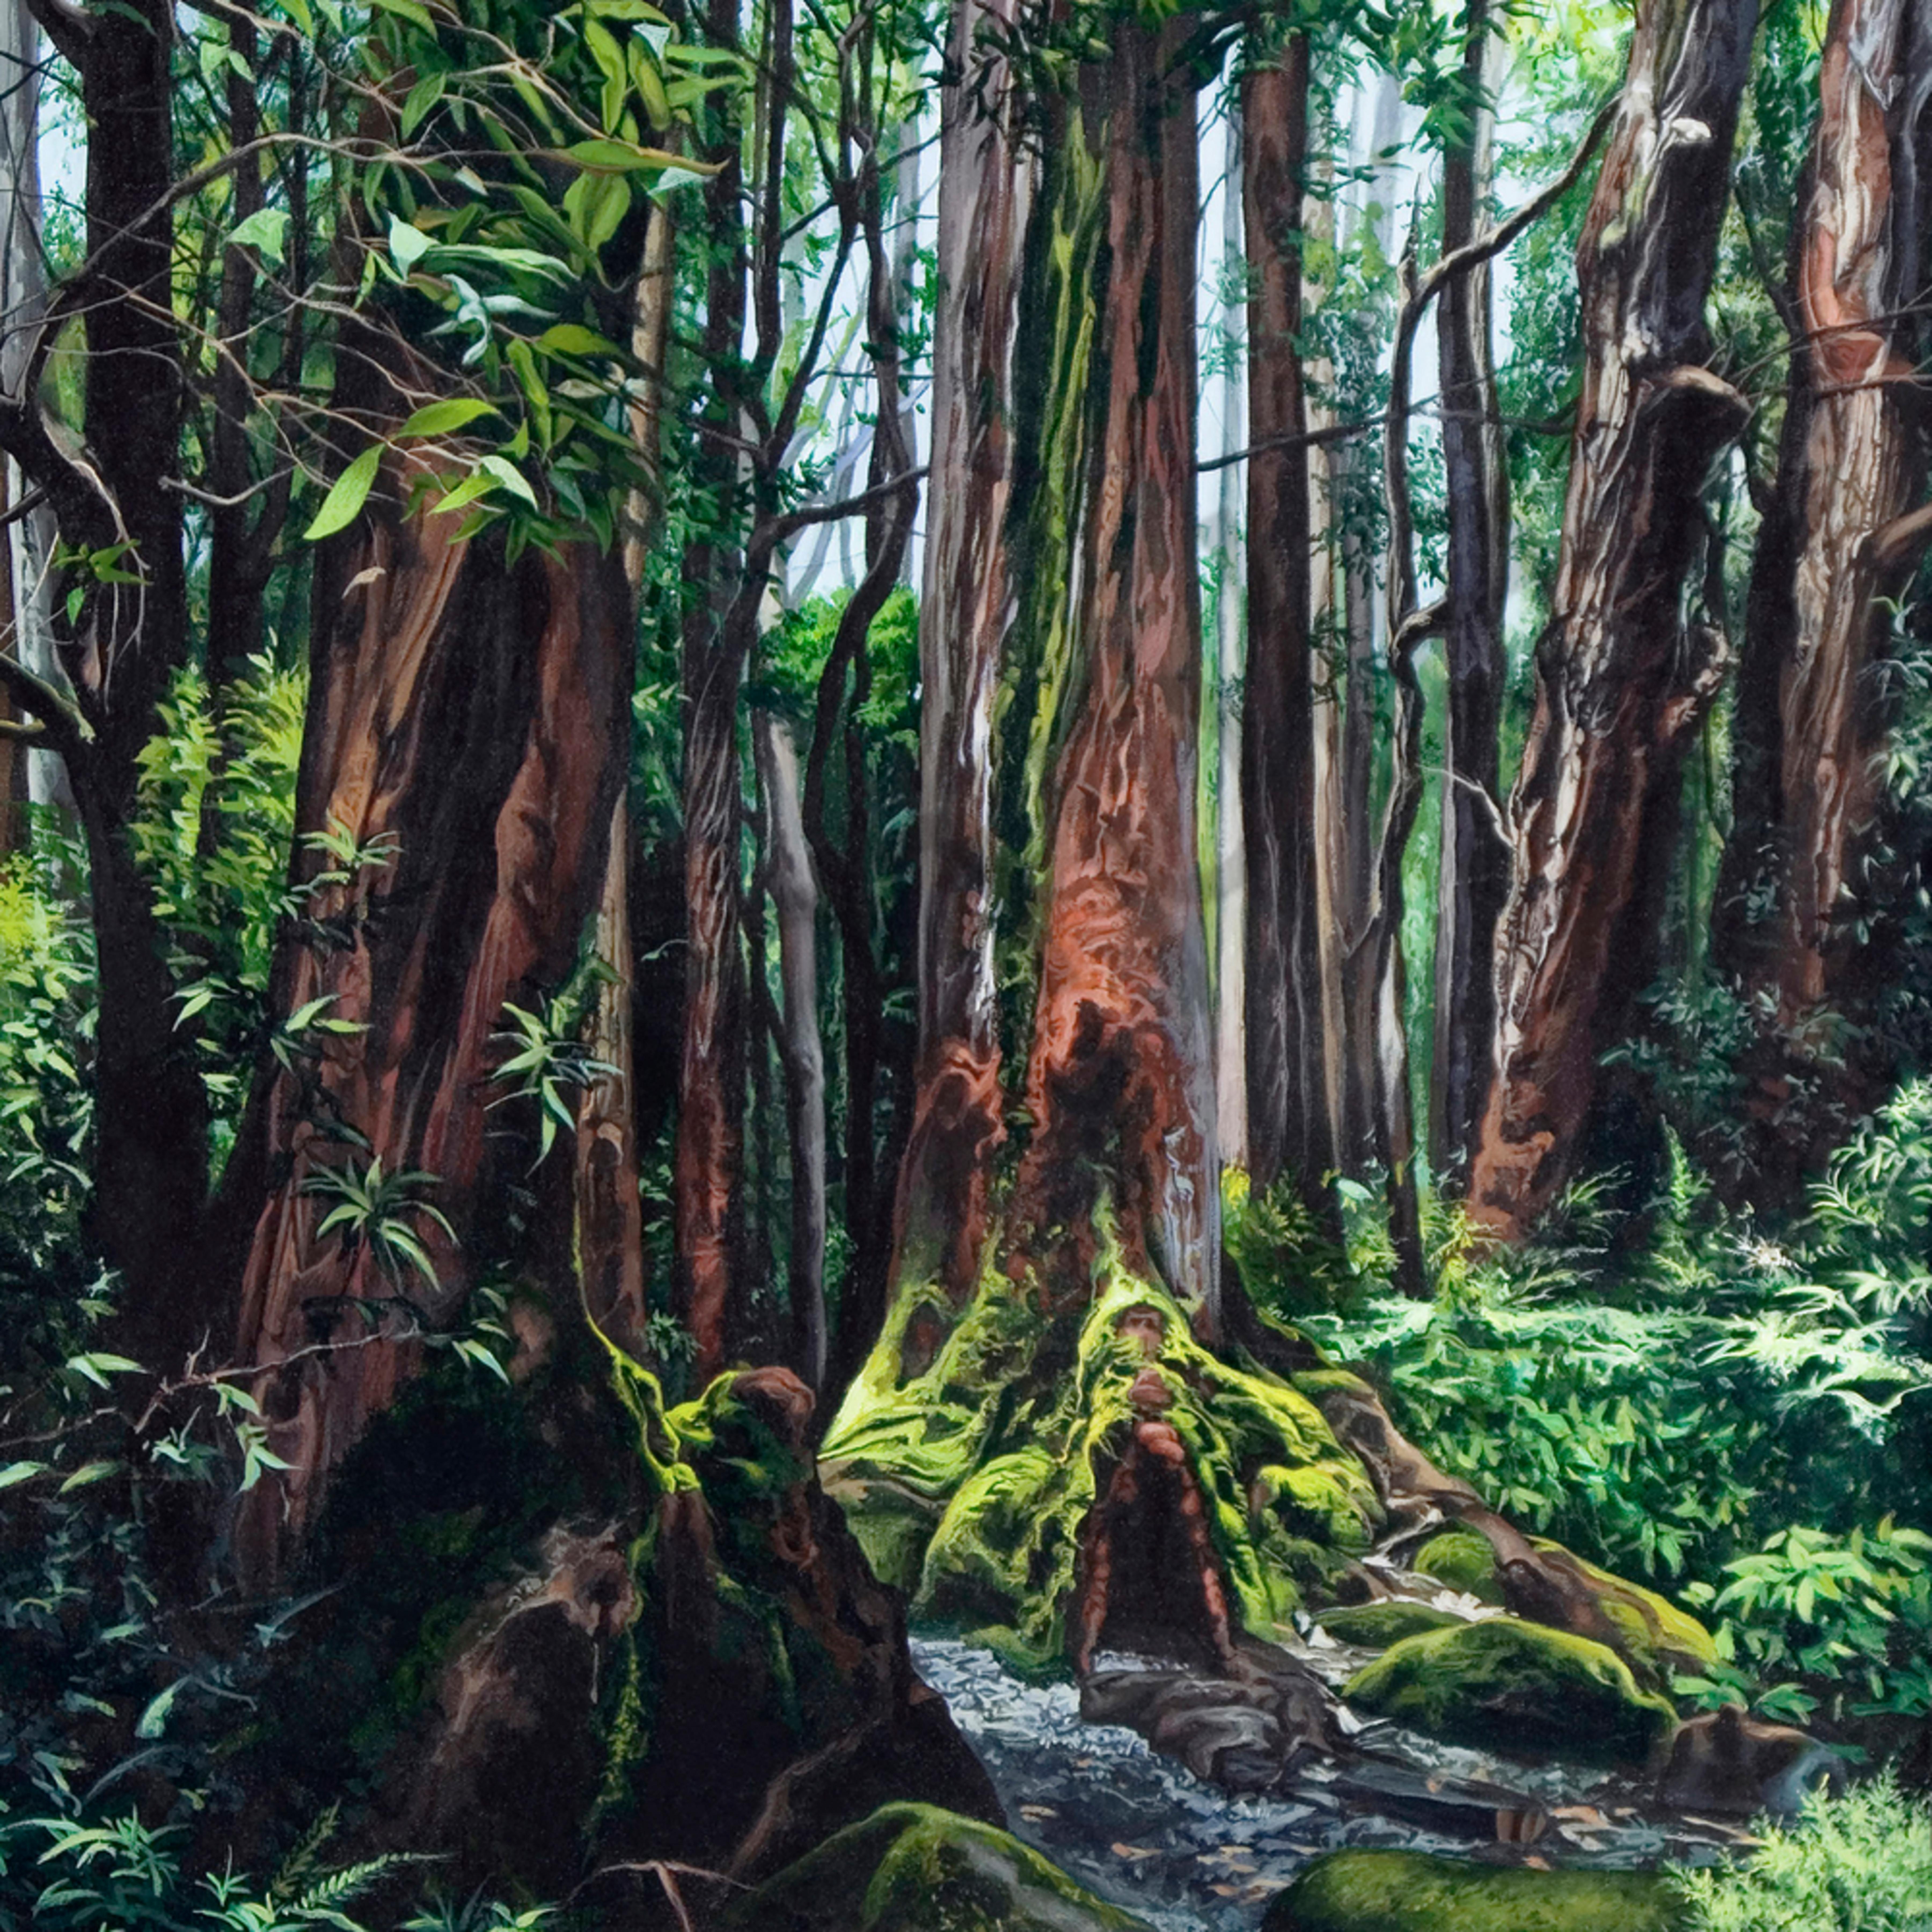 Rainforest print file xzpxlh